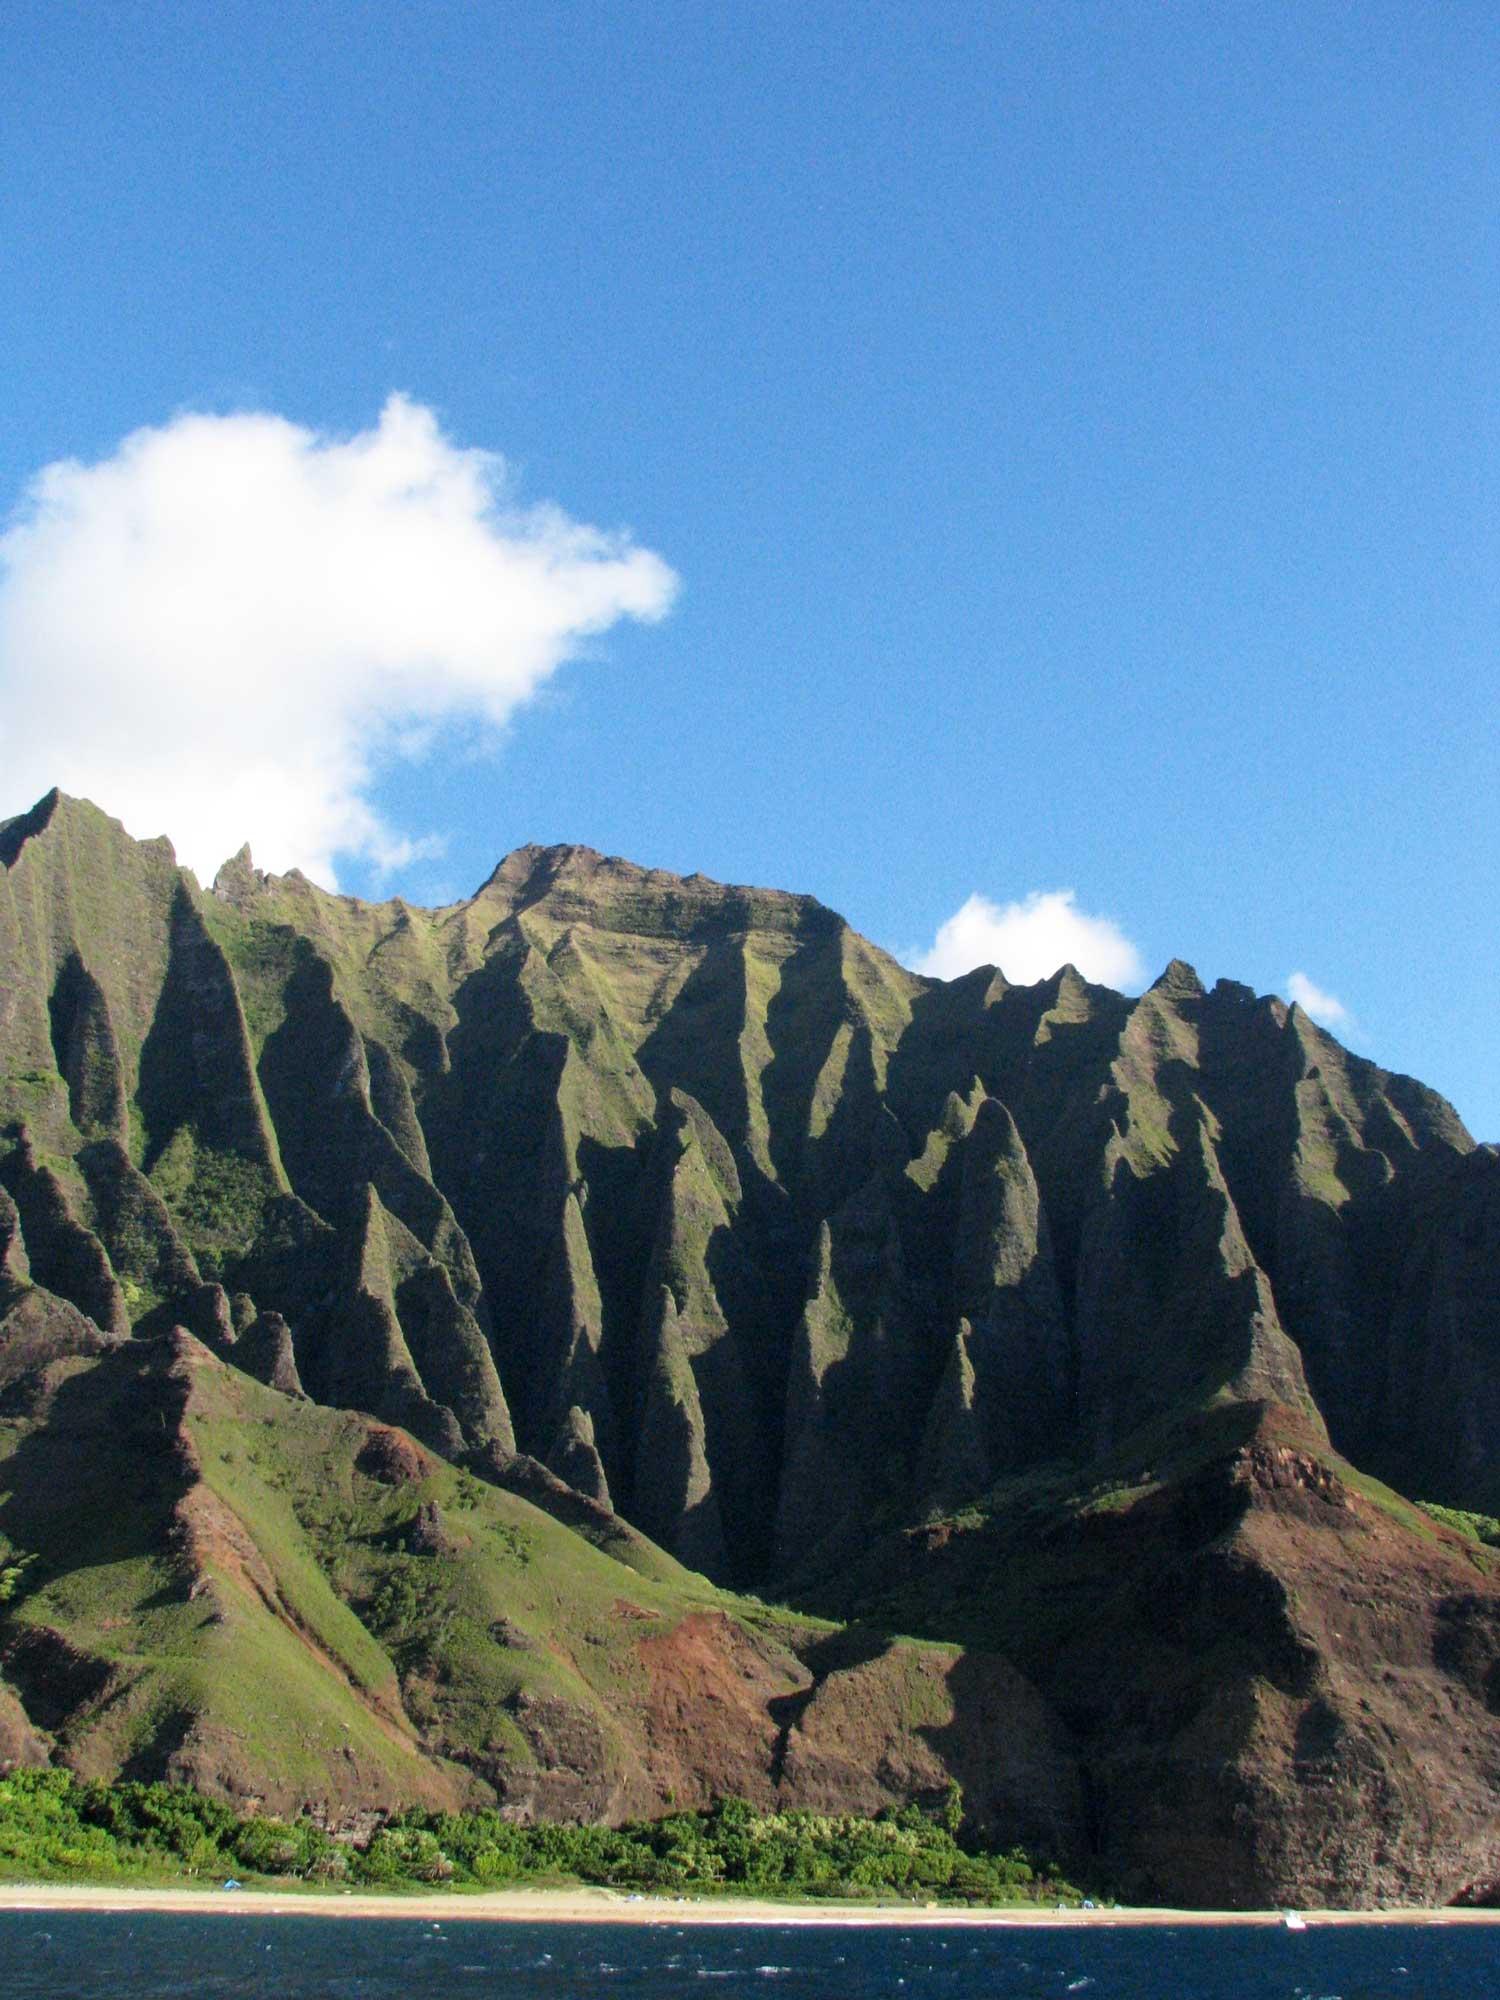 South Pacific Island Vacation destinations - Kauai hawaii